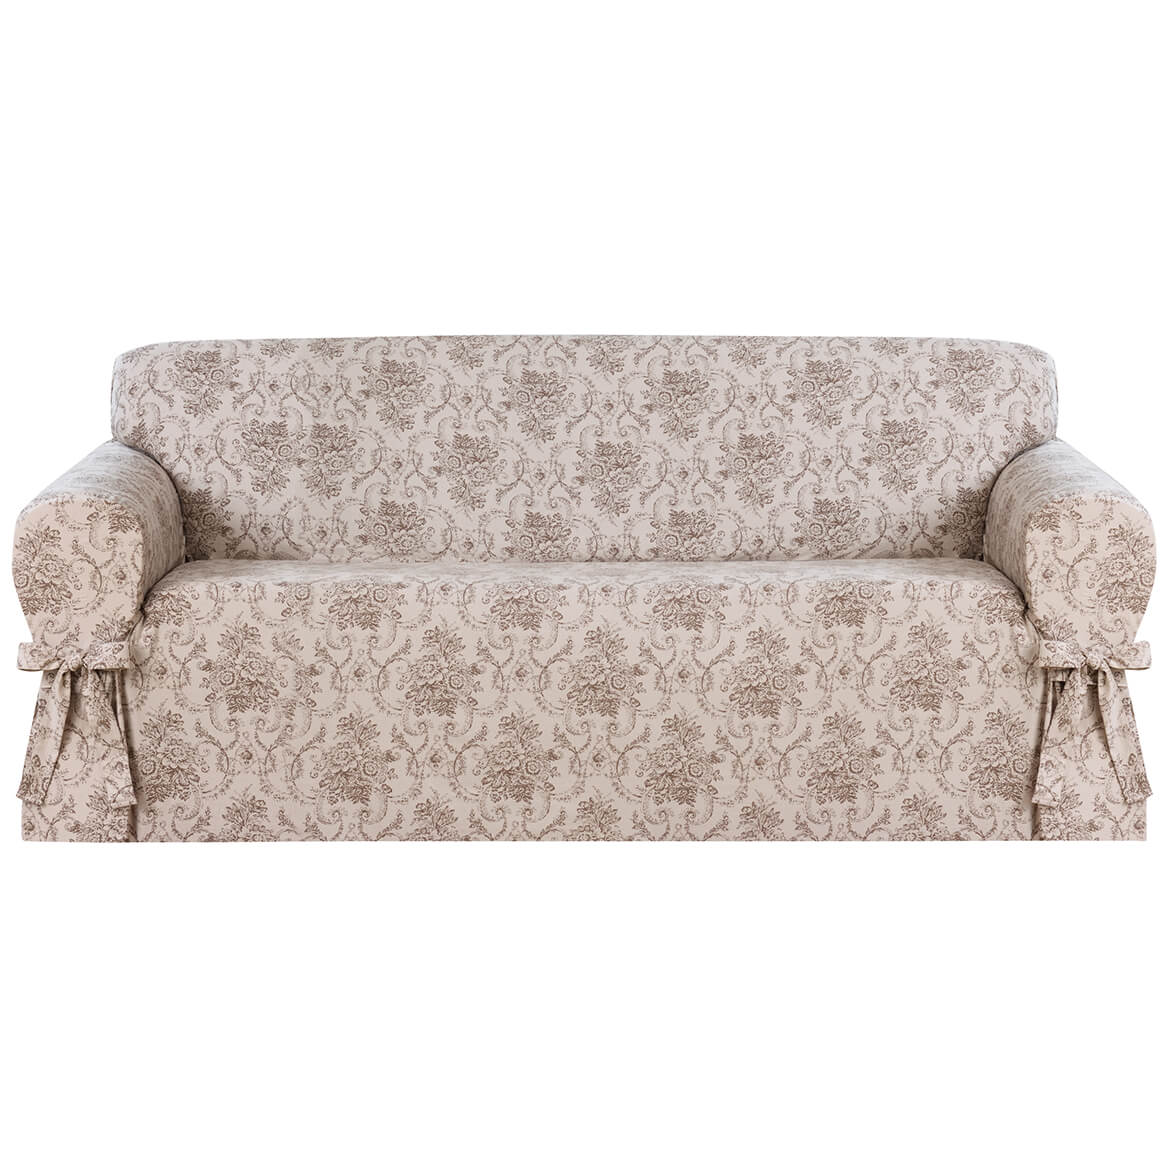 Kathy Ireland Chateau Sofa Slipcover-362617